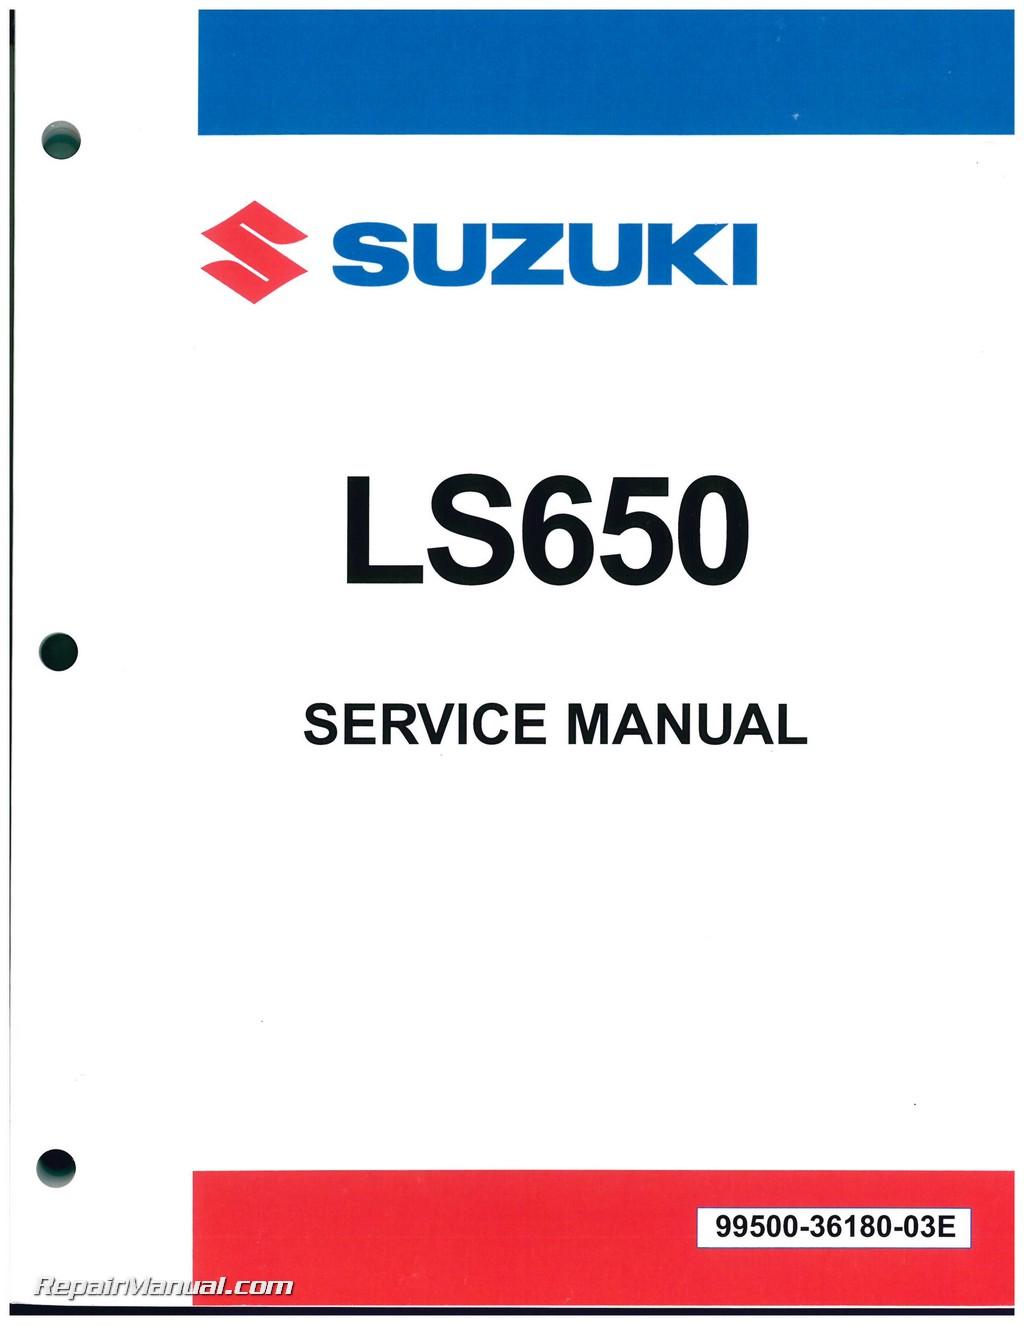 LS650 Savage / S40 Boulevard 1986-2009 Suzuki Motorcycle Service Manual